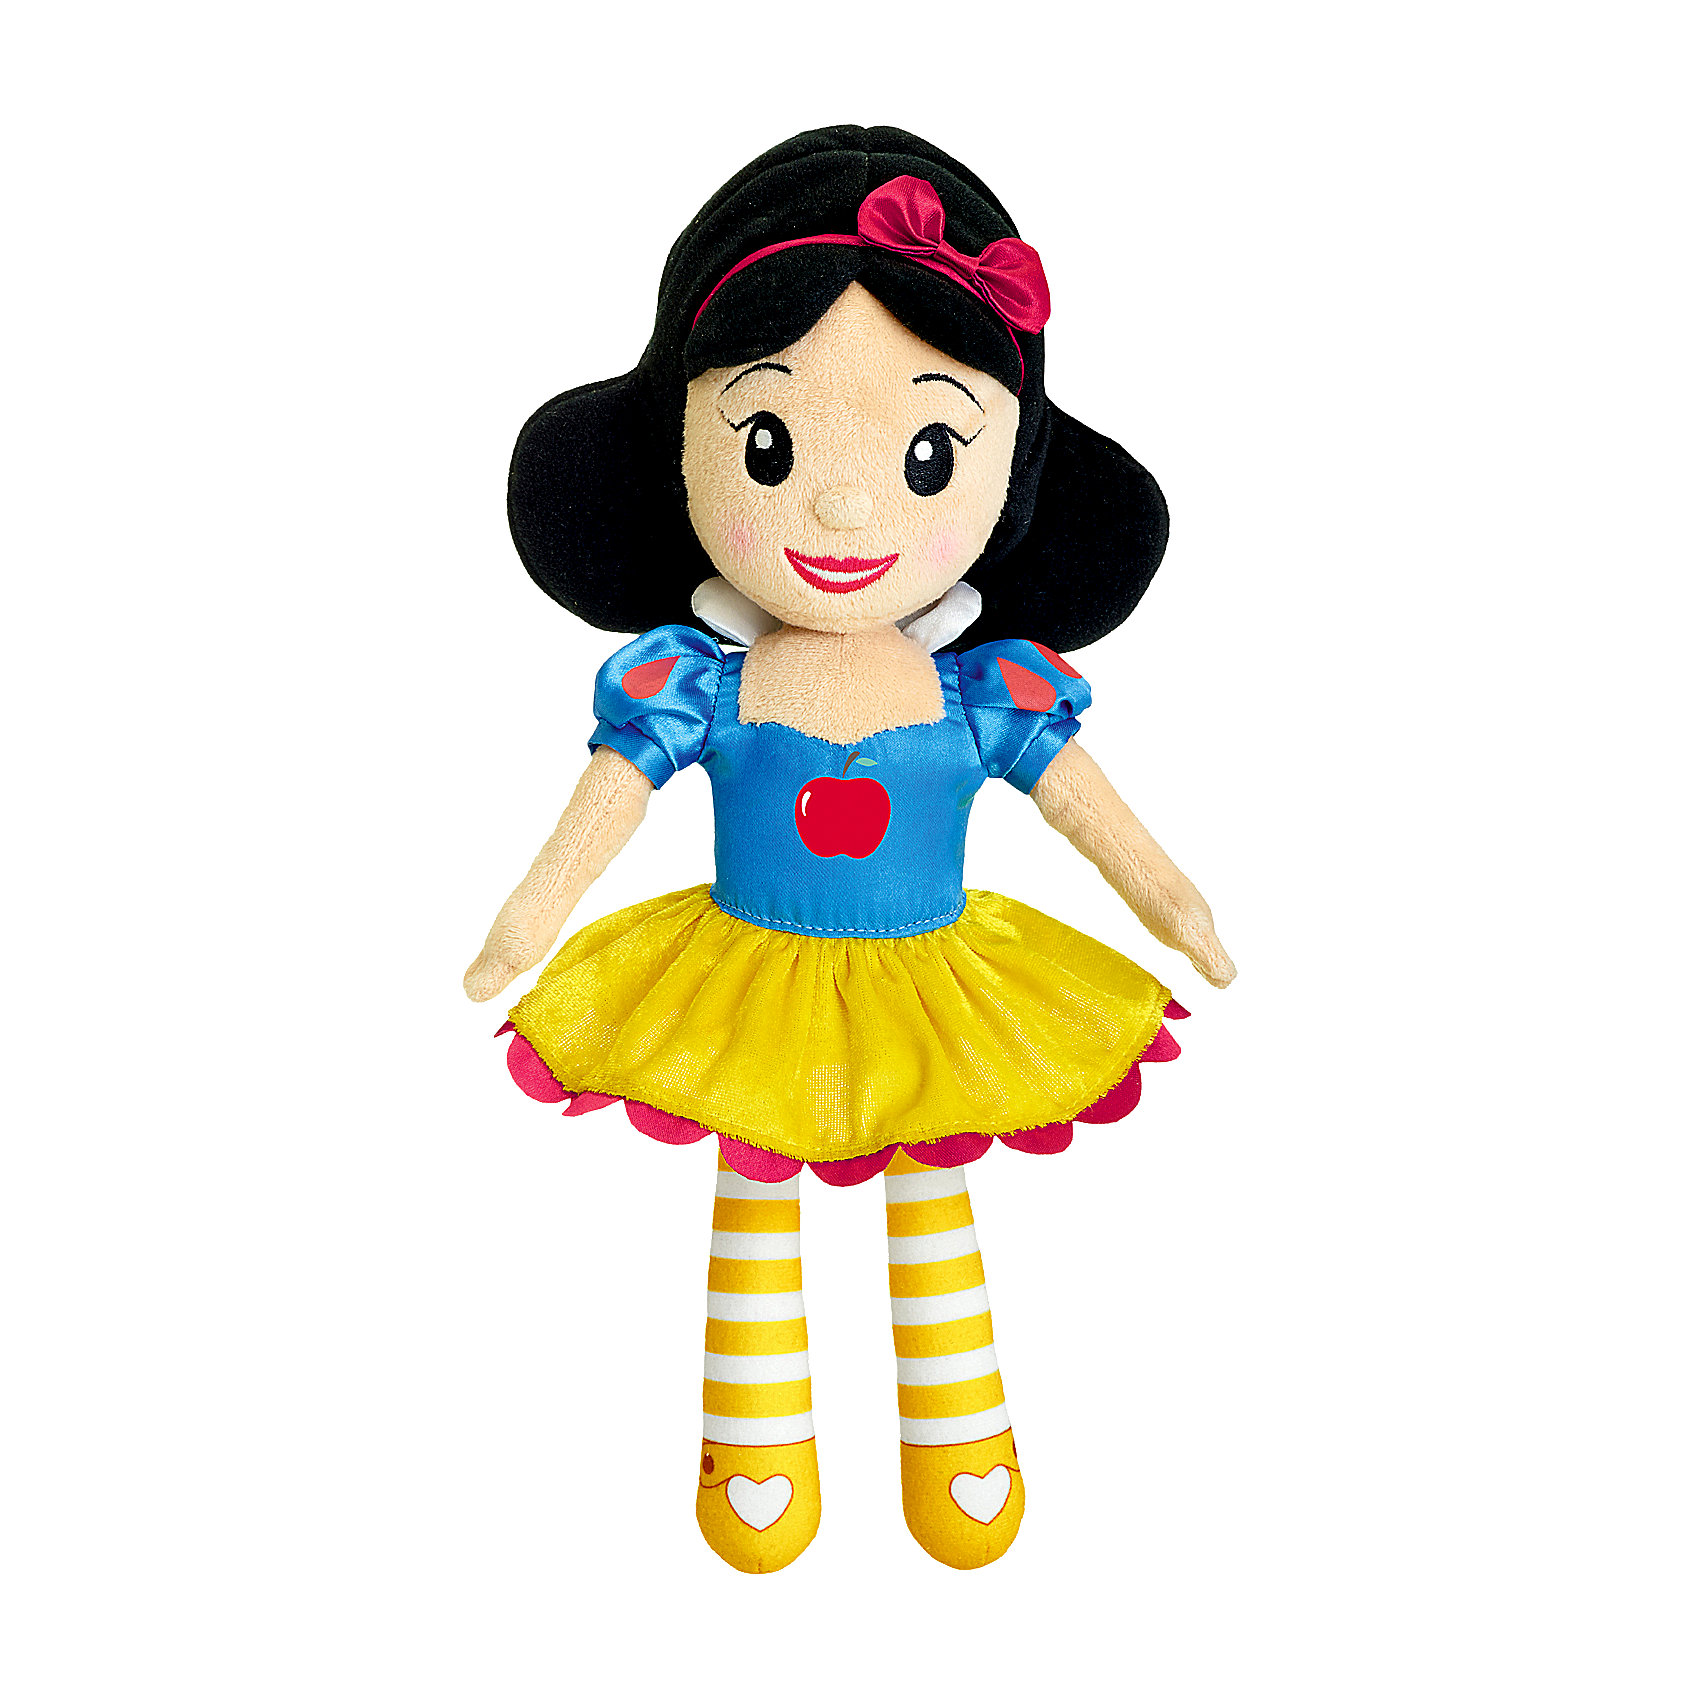 CHICCO Мягкая игрушка с мелодией Белоснежка, Disney, CHICCO chicco мягкая игрушкас с мелодией золушка disney chicco